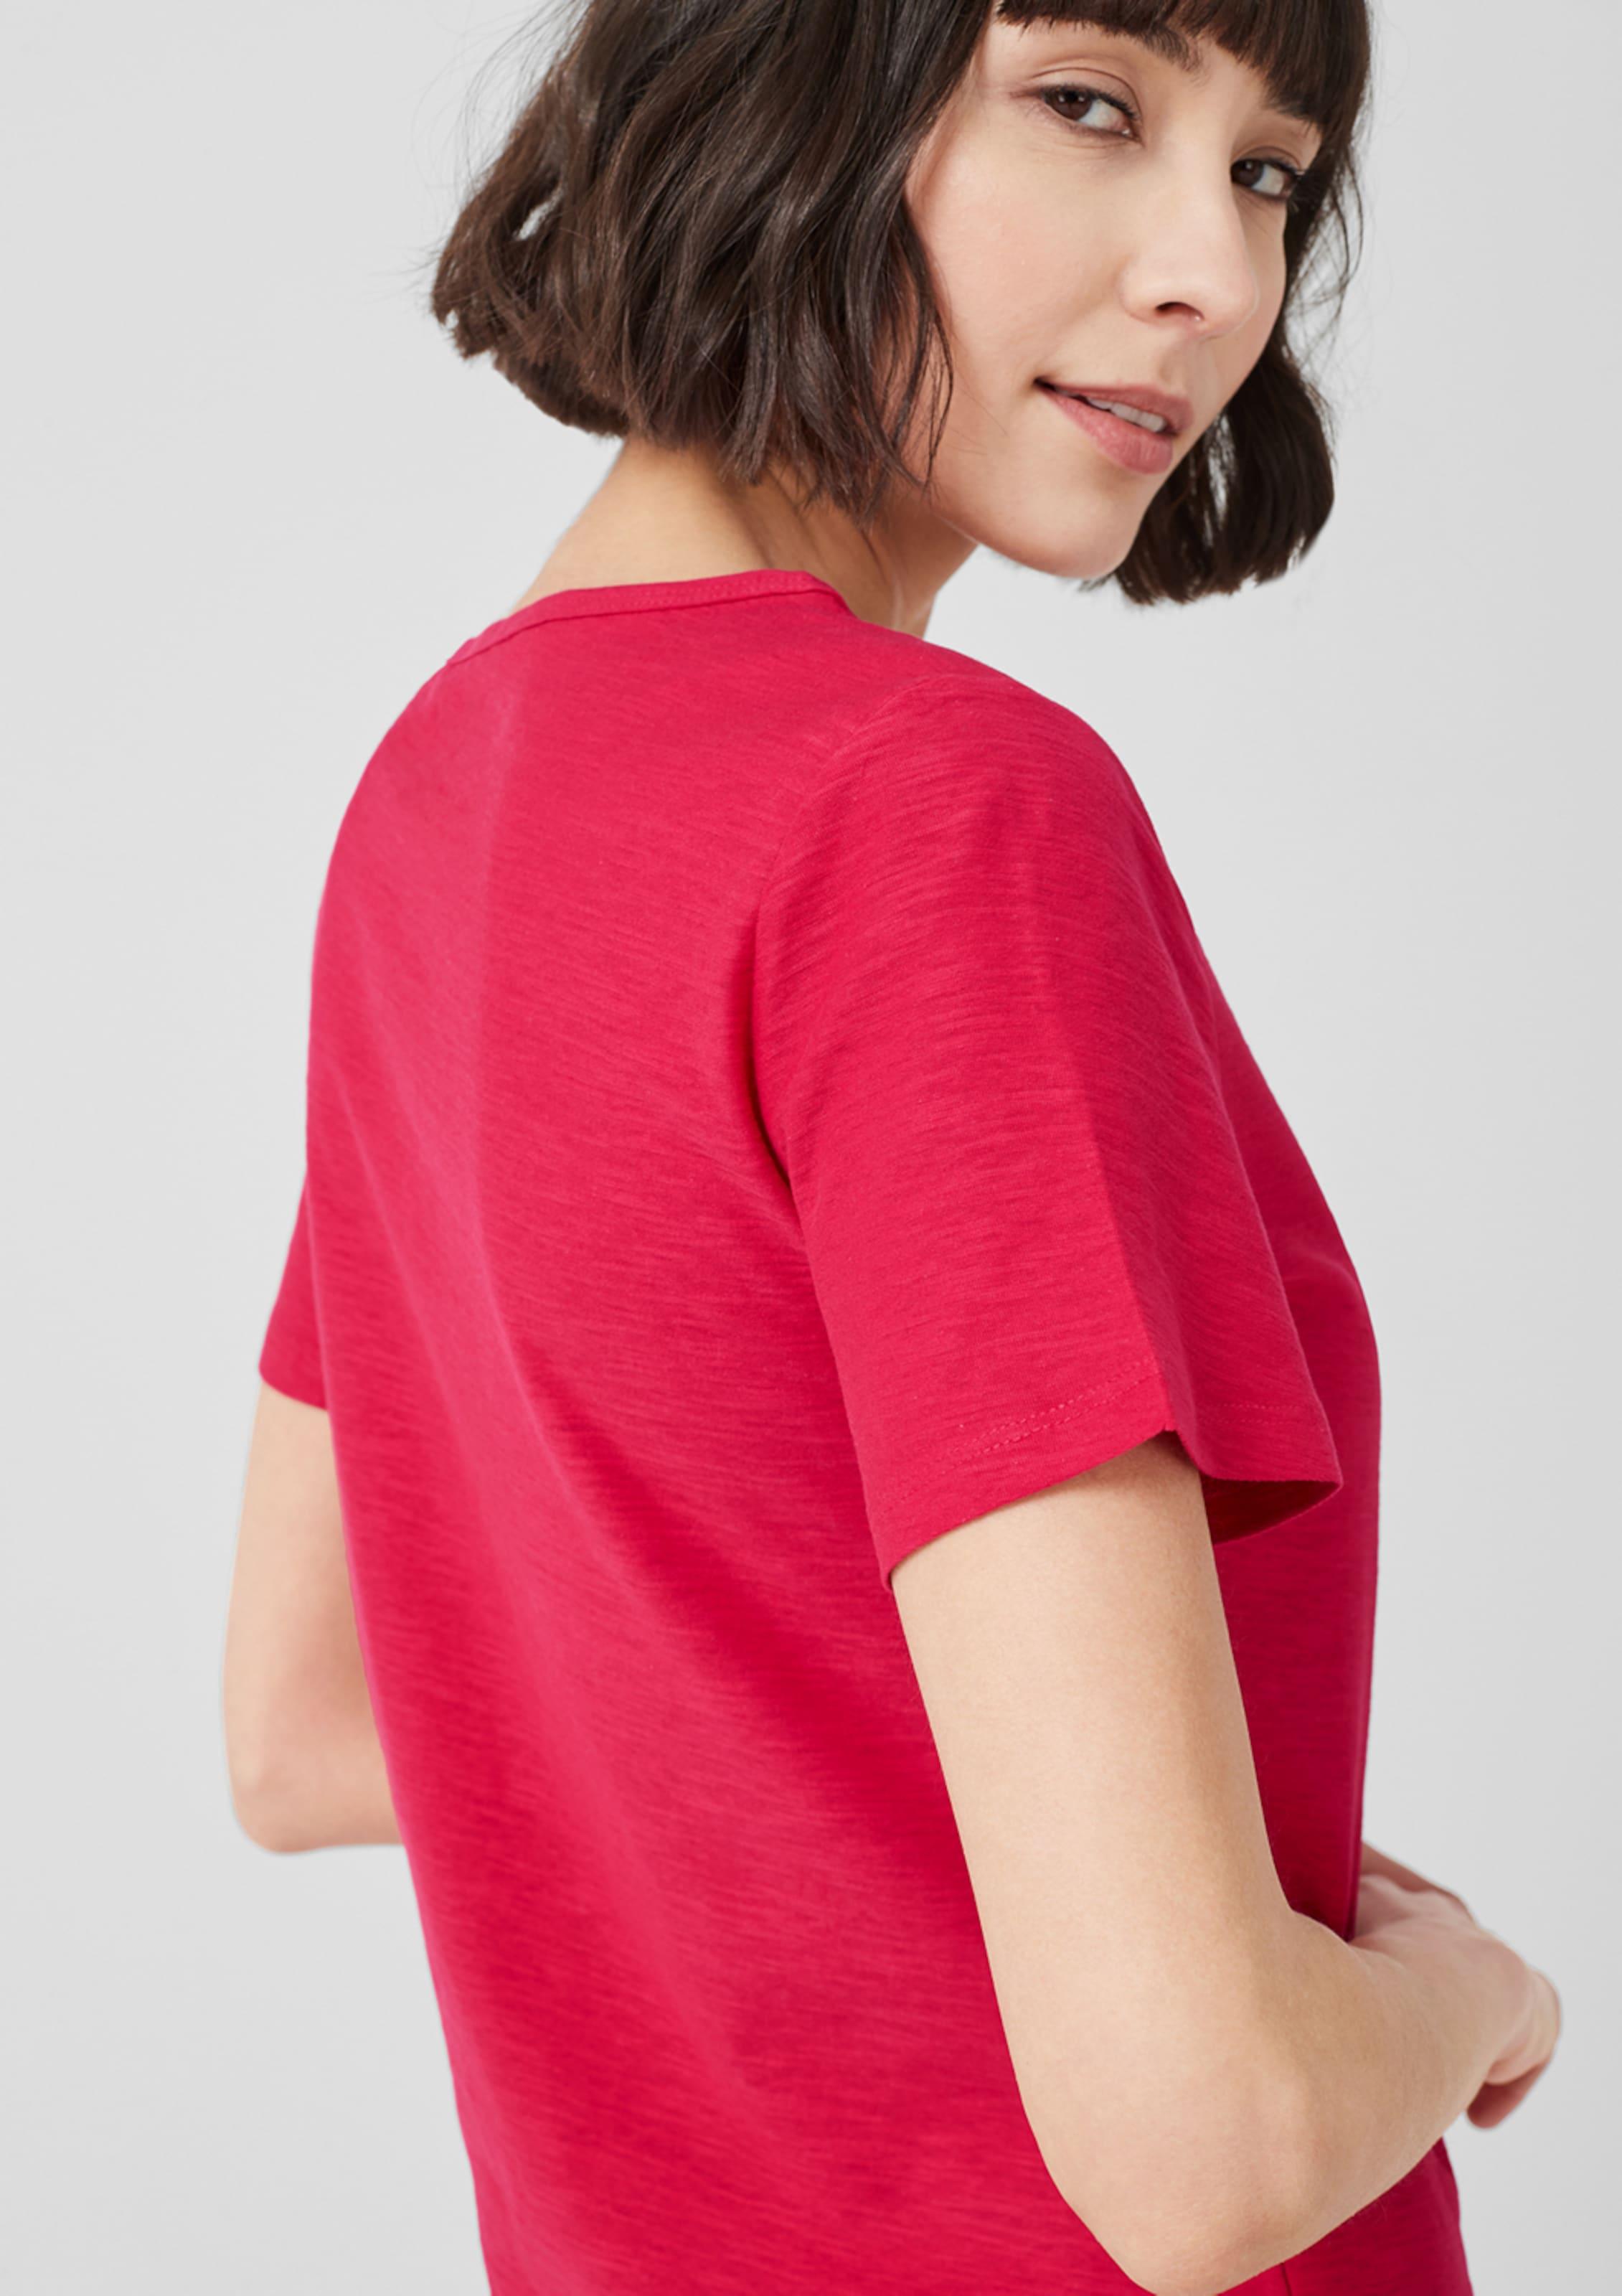 Shirt In Red Pitaya S Label oliver 9YEDIH2W